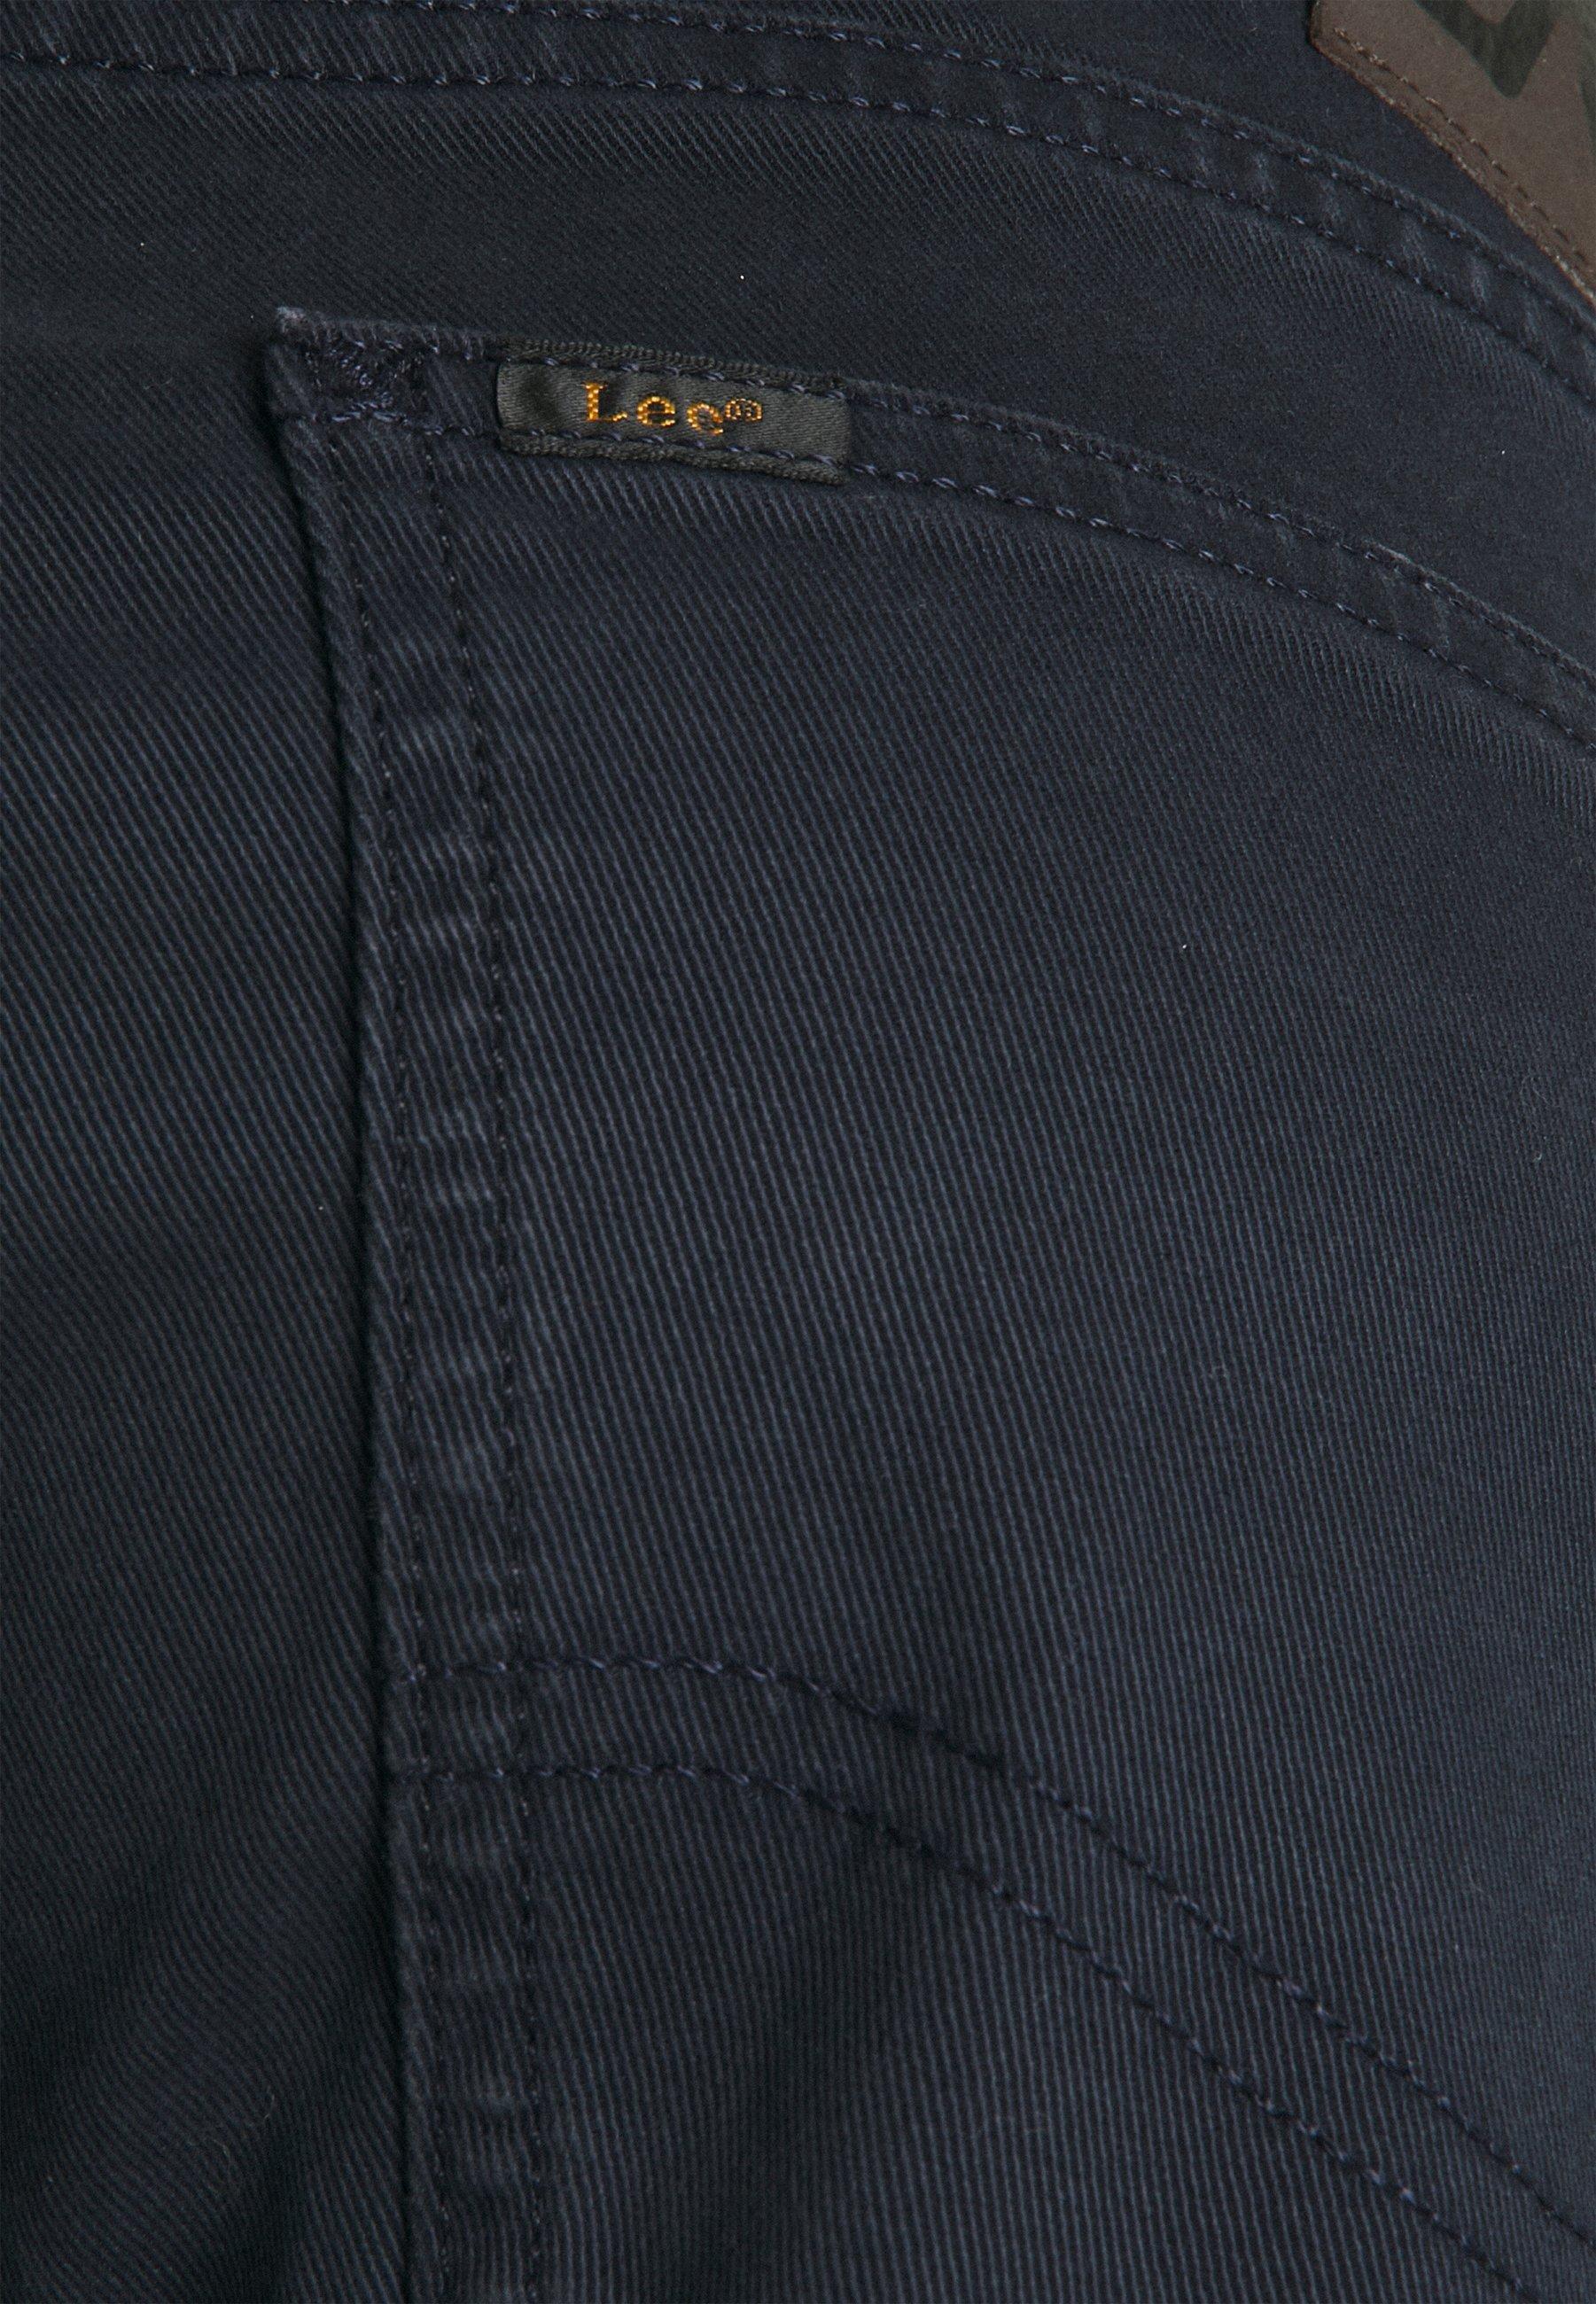 Lee Luke - Jeans Slim Fit Sky Captain/mørkeblå